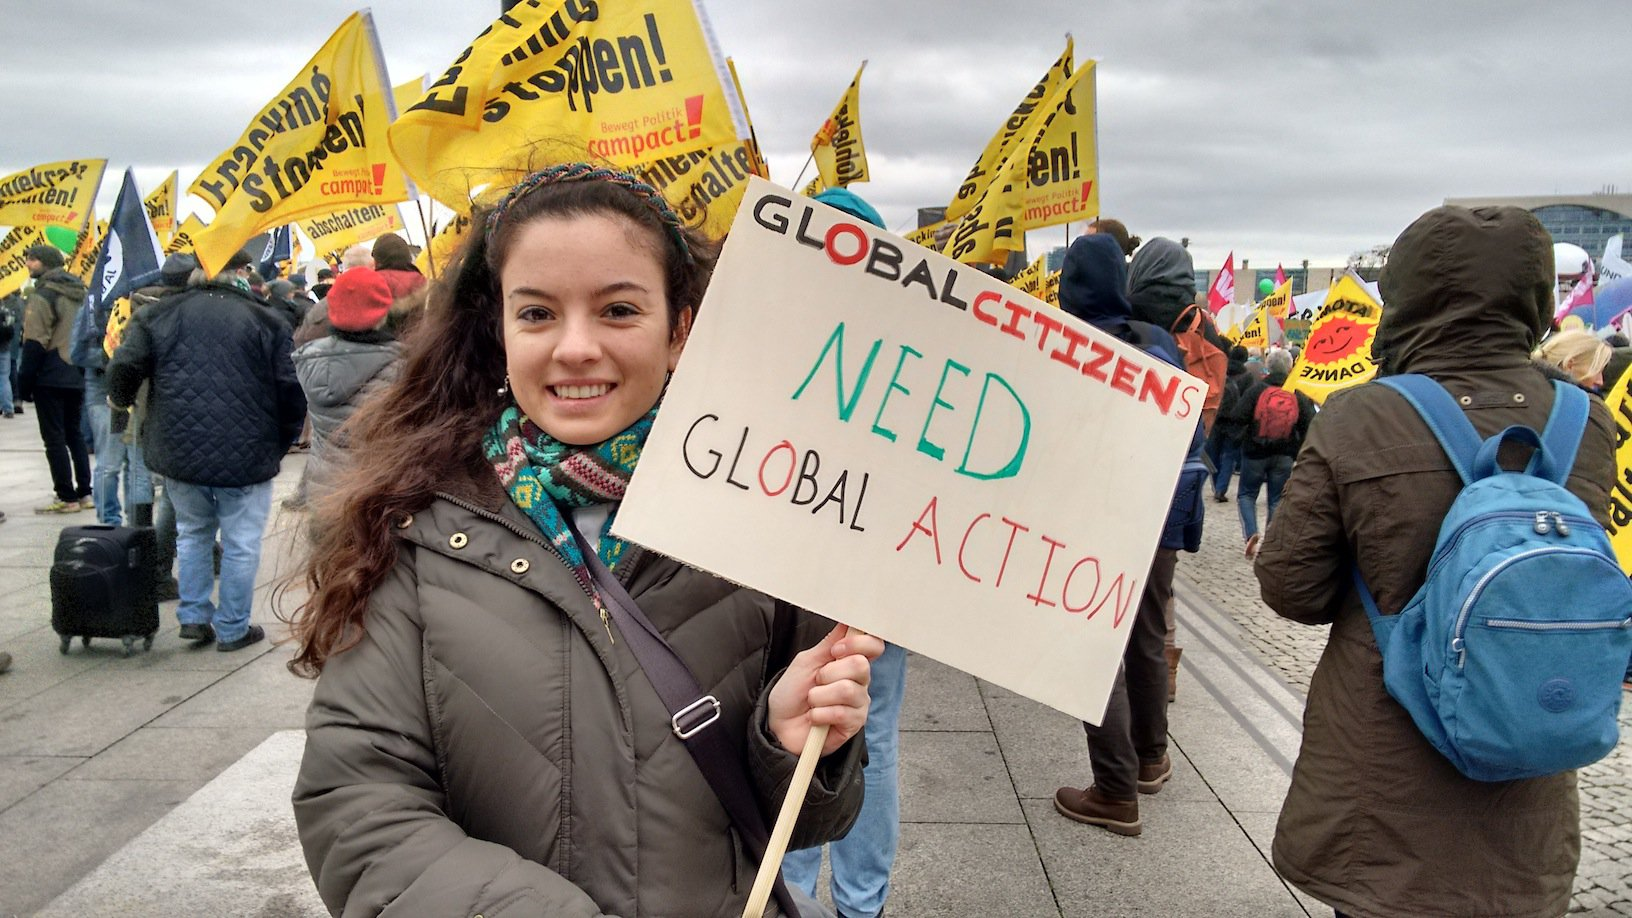 GCs need GlobalAction.jpeg